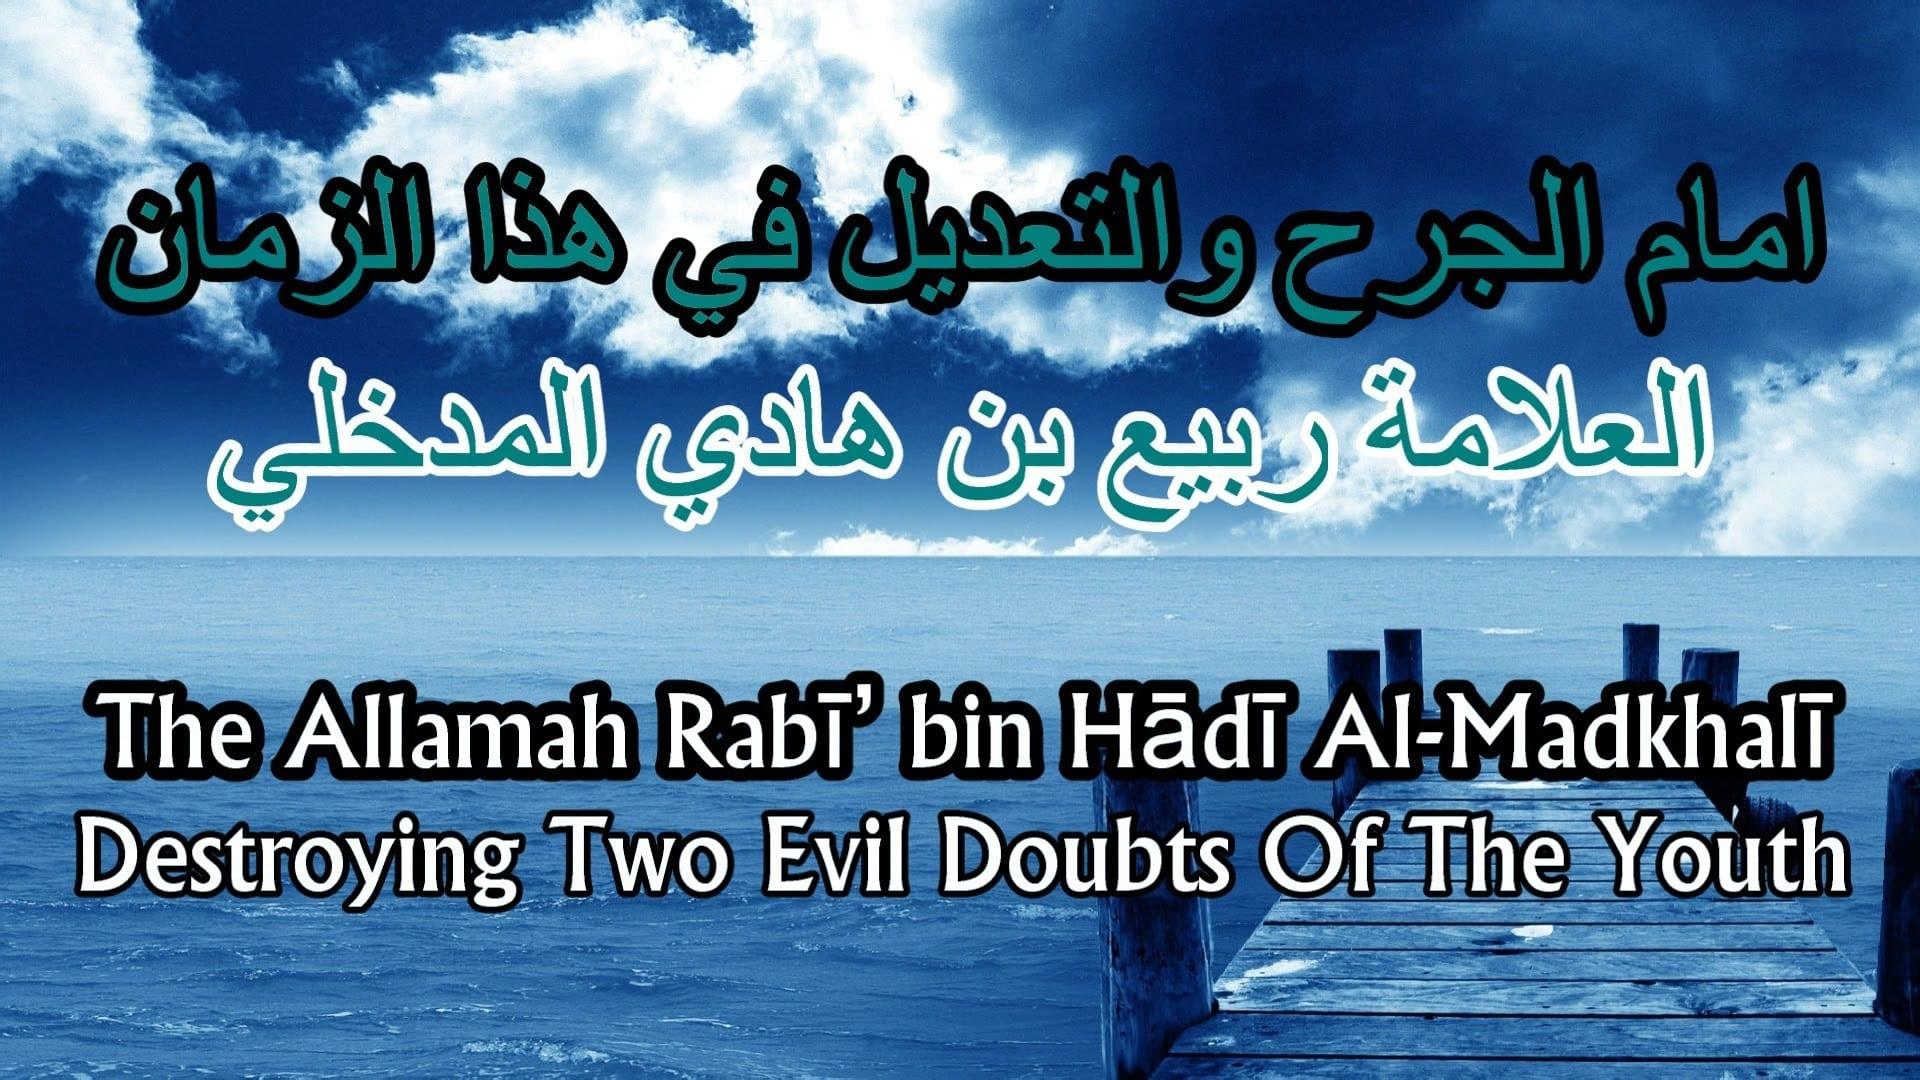 A Severe Warning Against Two Evil Doubts | Shaikh Rabī' al-Madkhalī